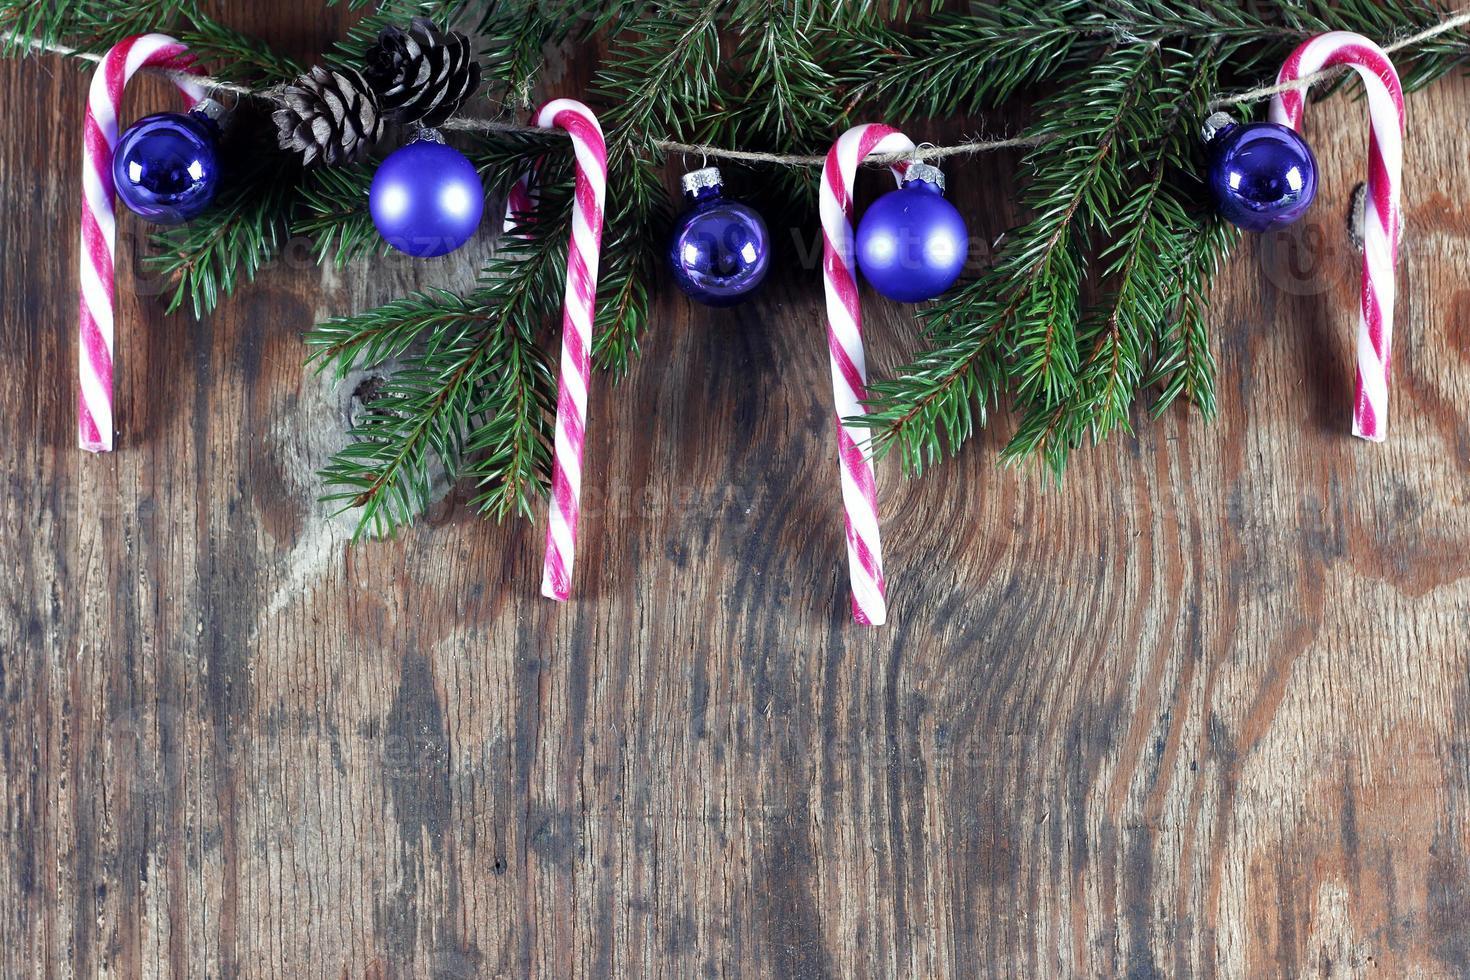 palitos de caramelo bola de navidad adorno foto